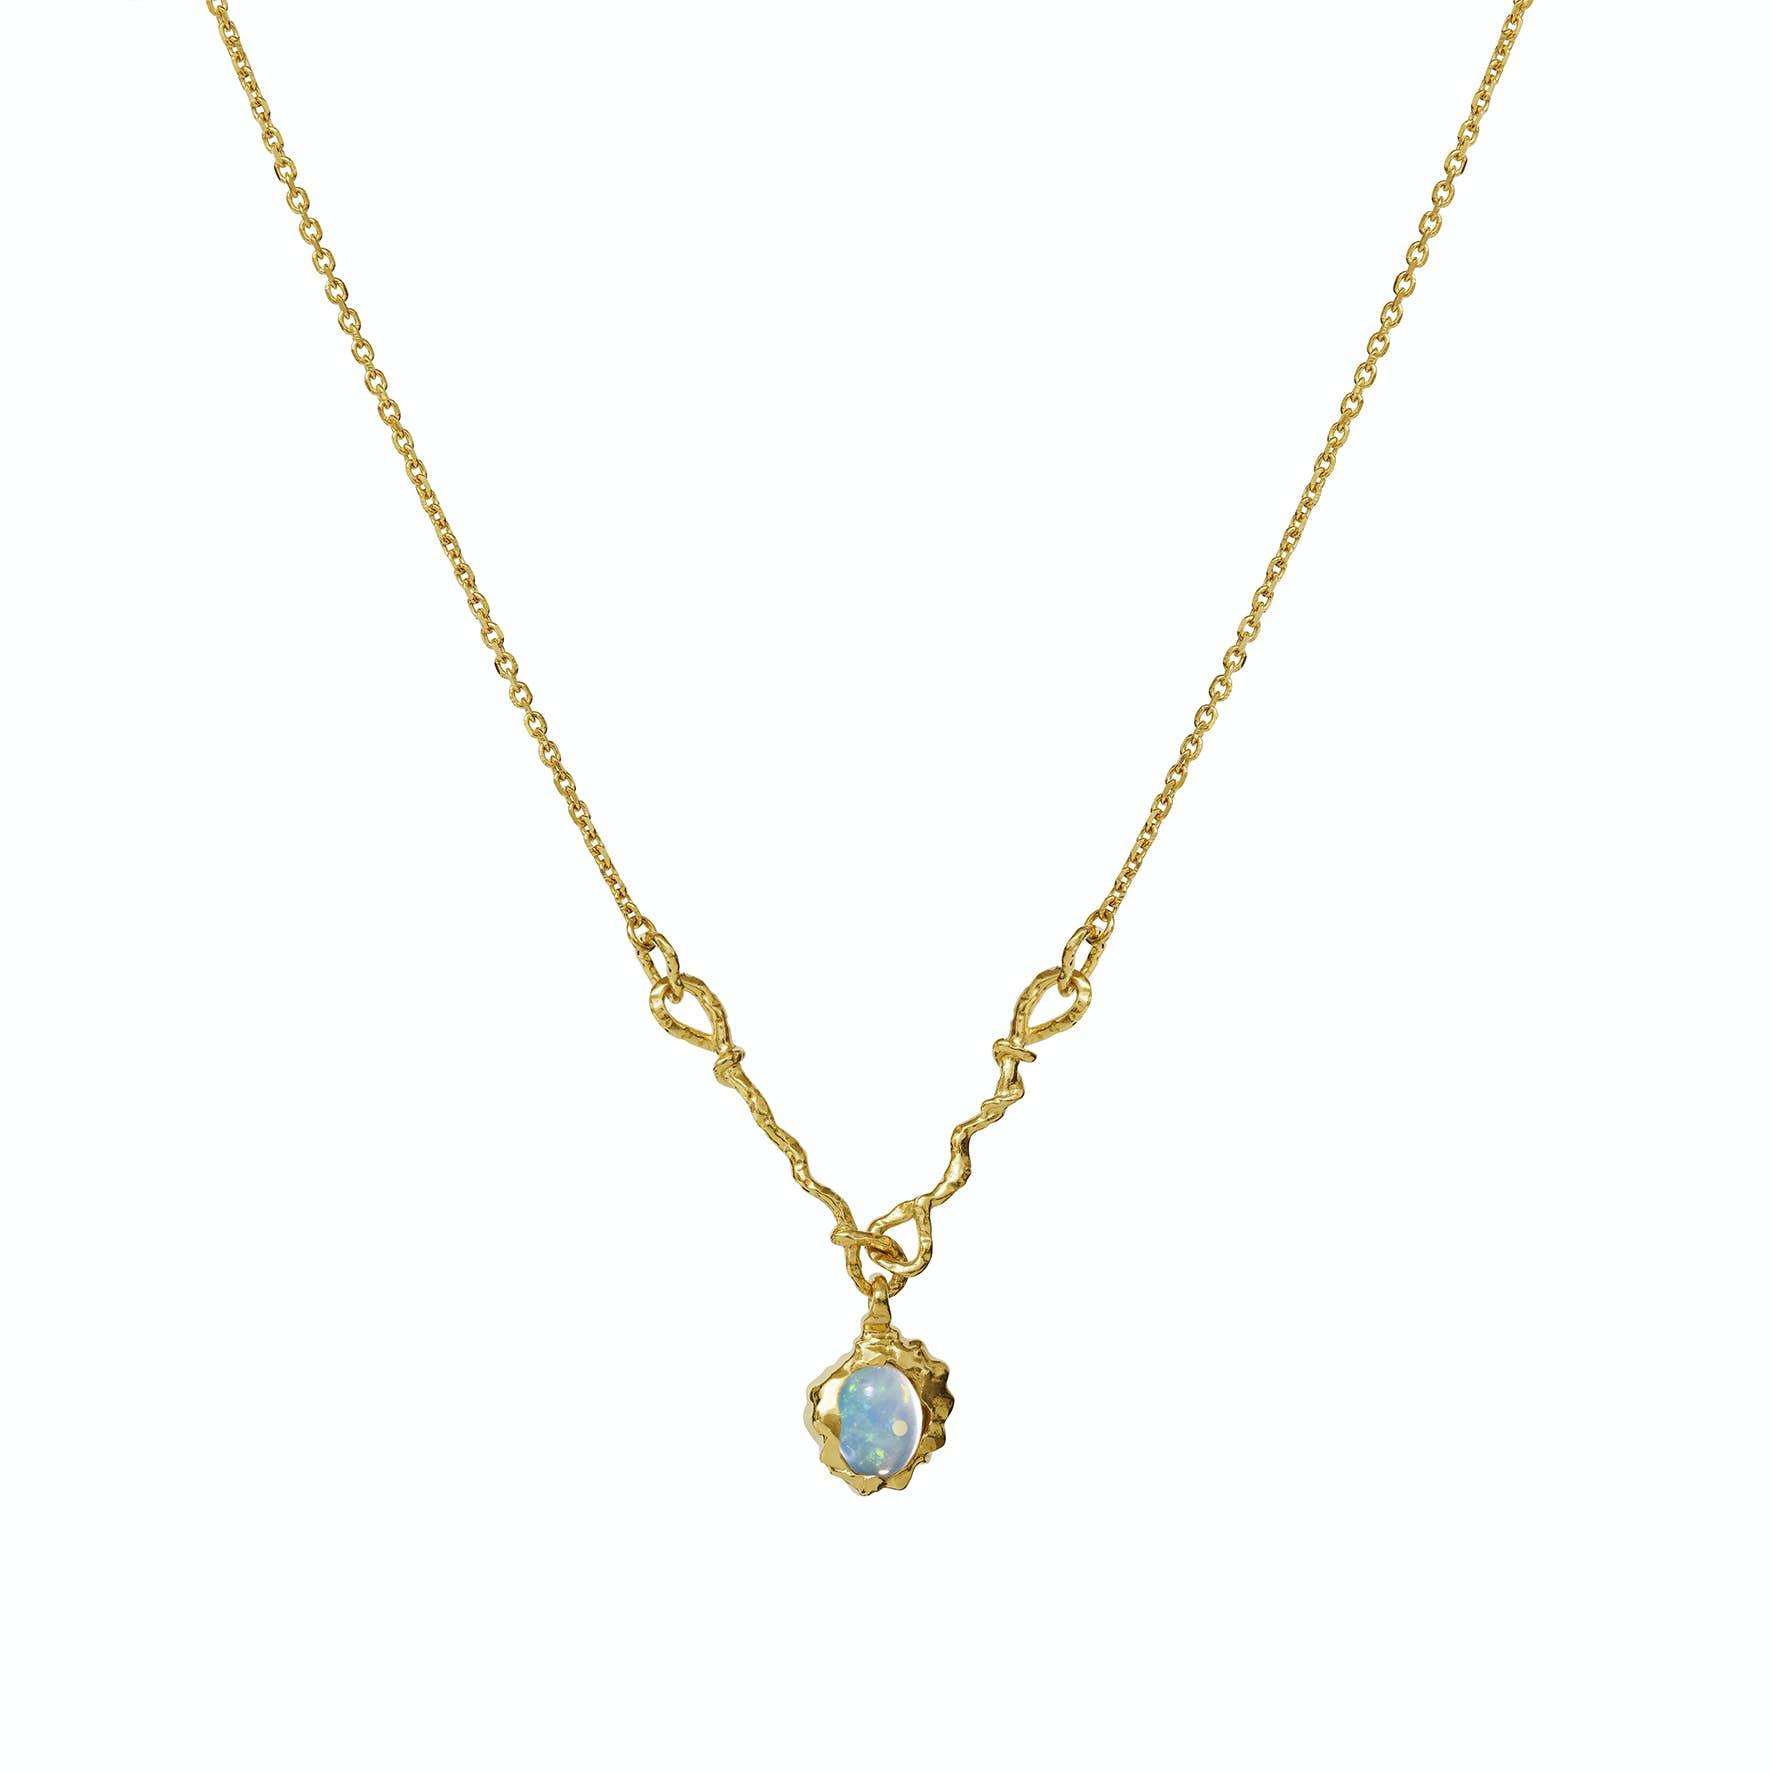 Phoenix Necklace fra Maanesten i Forgyldt-Sølv Sterling 925